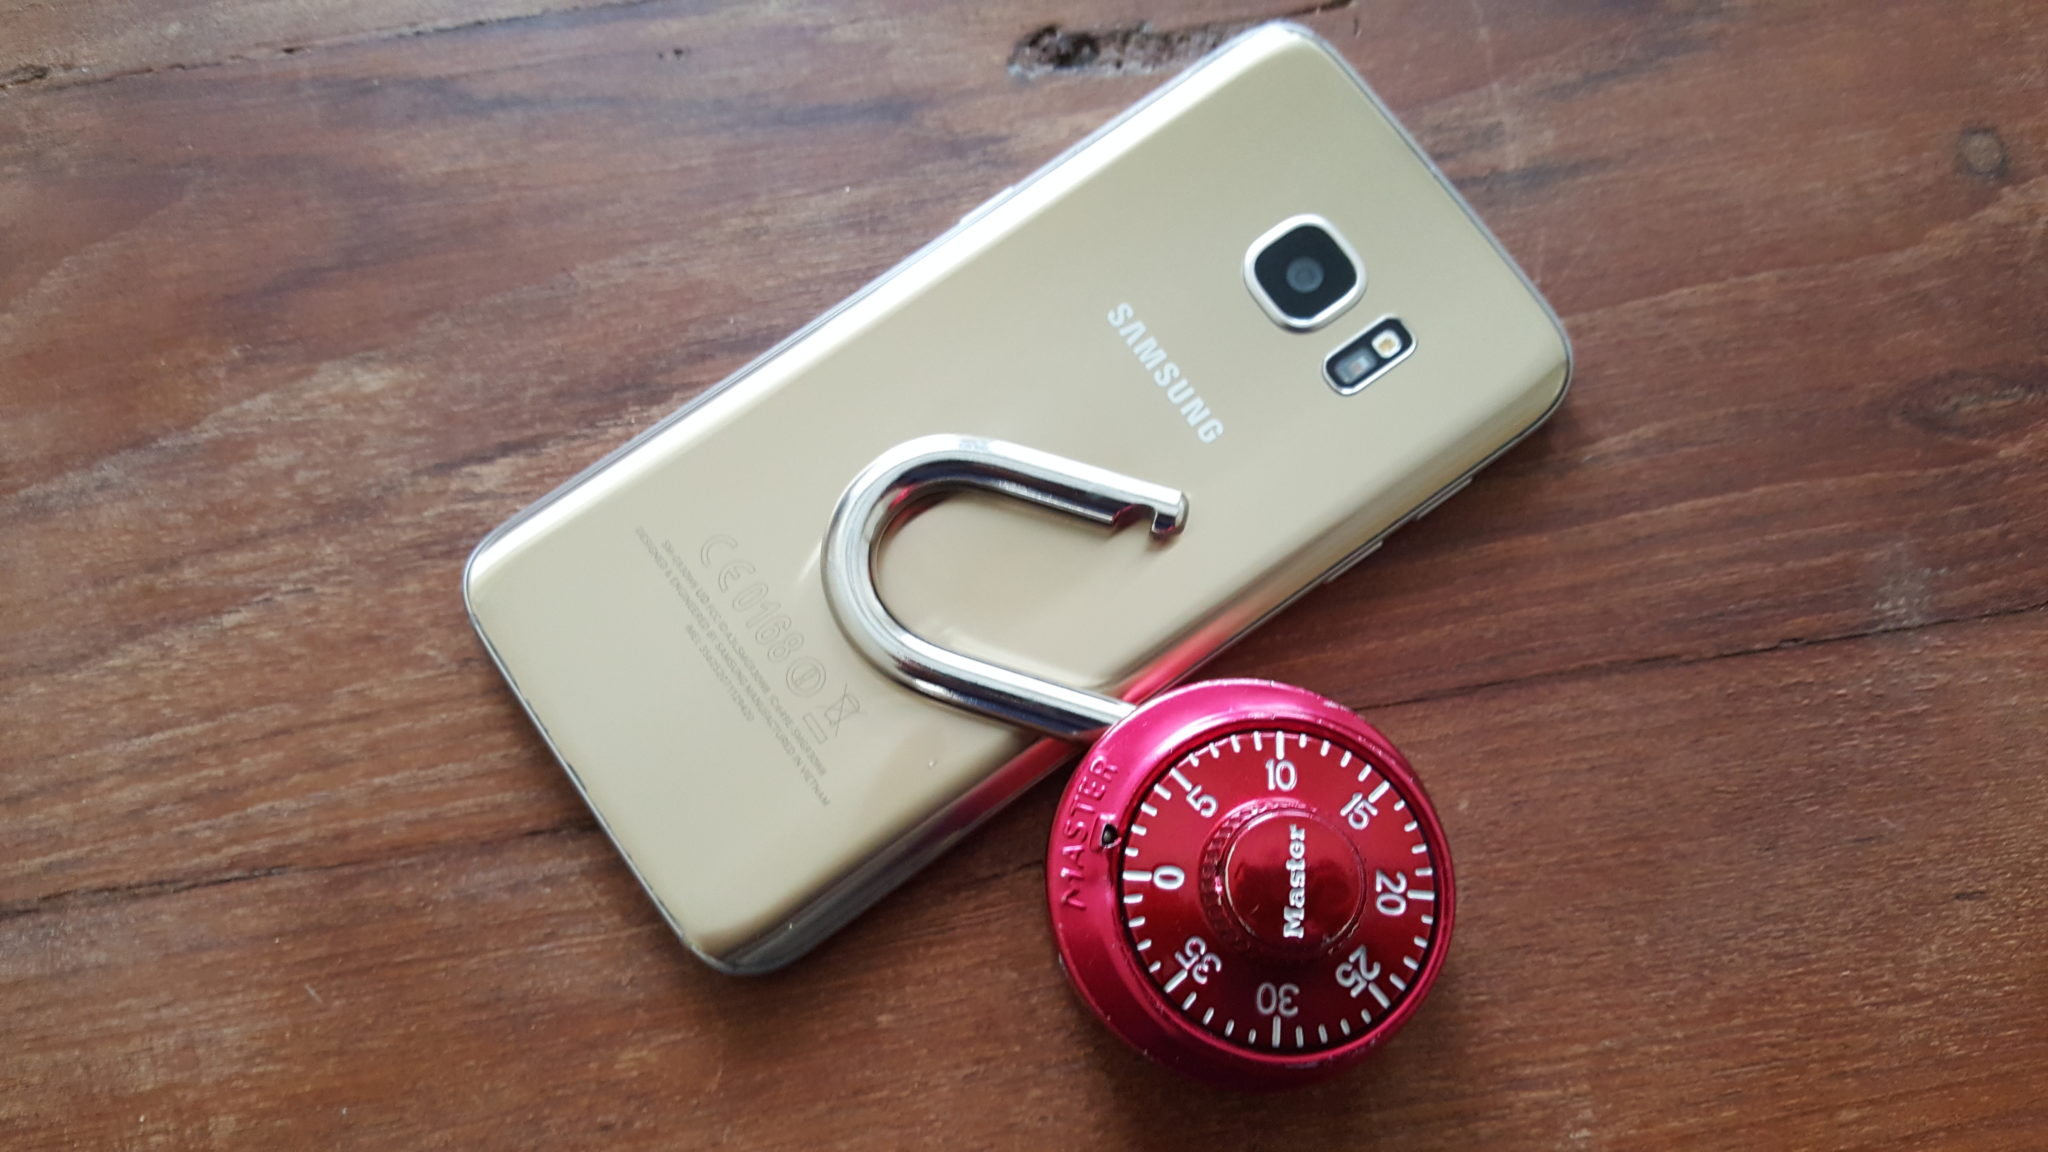 Samsung with unlocked padlock